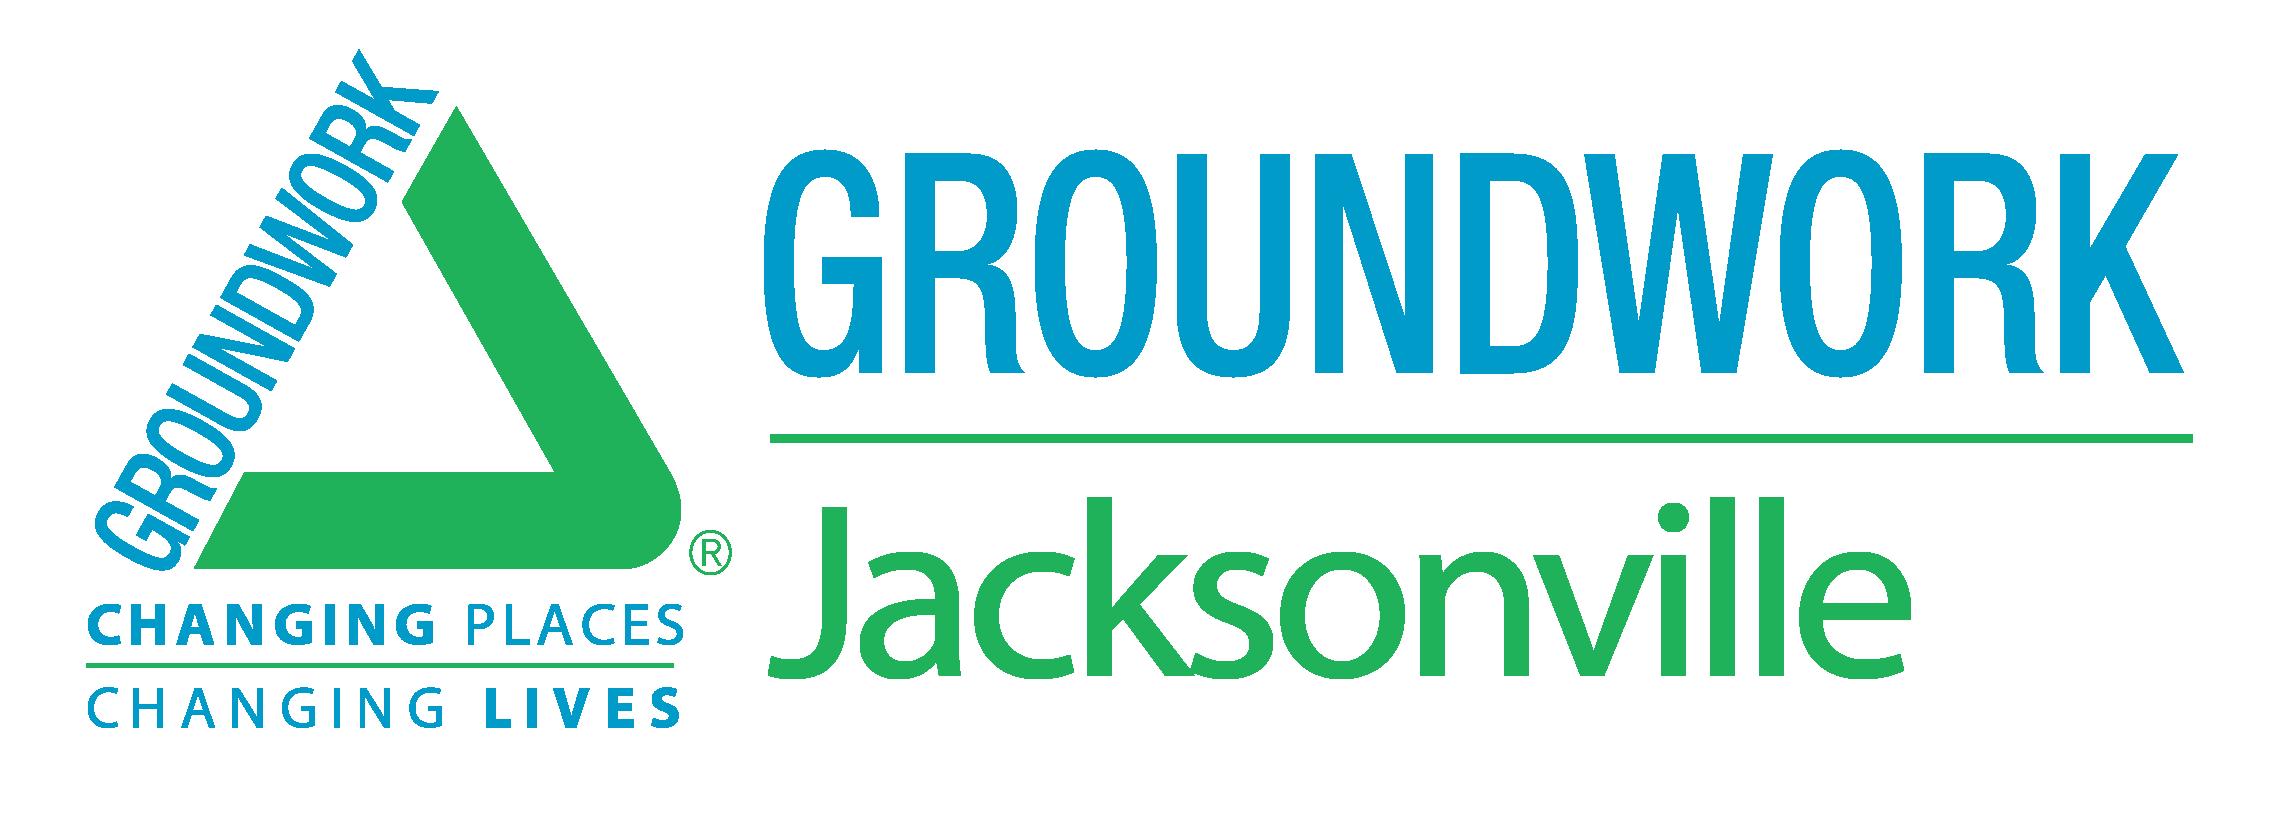 Groundwork Jacksonville logo